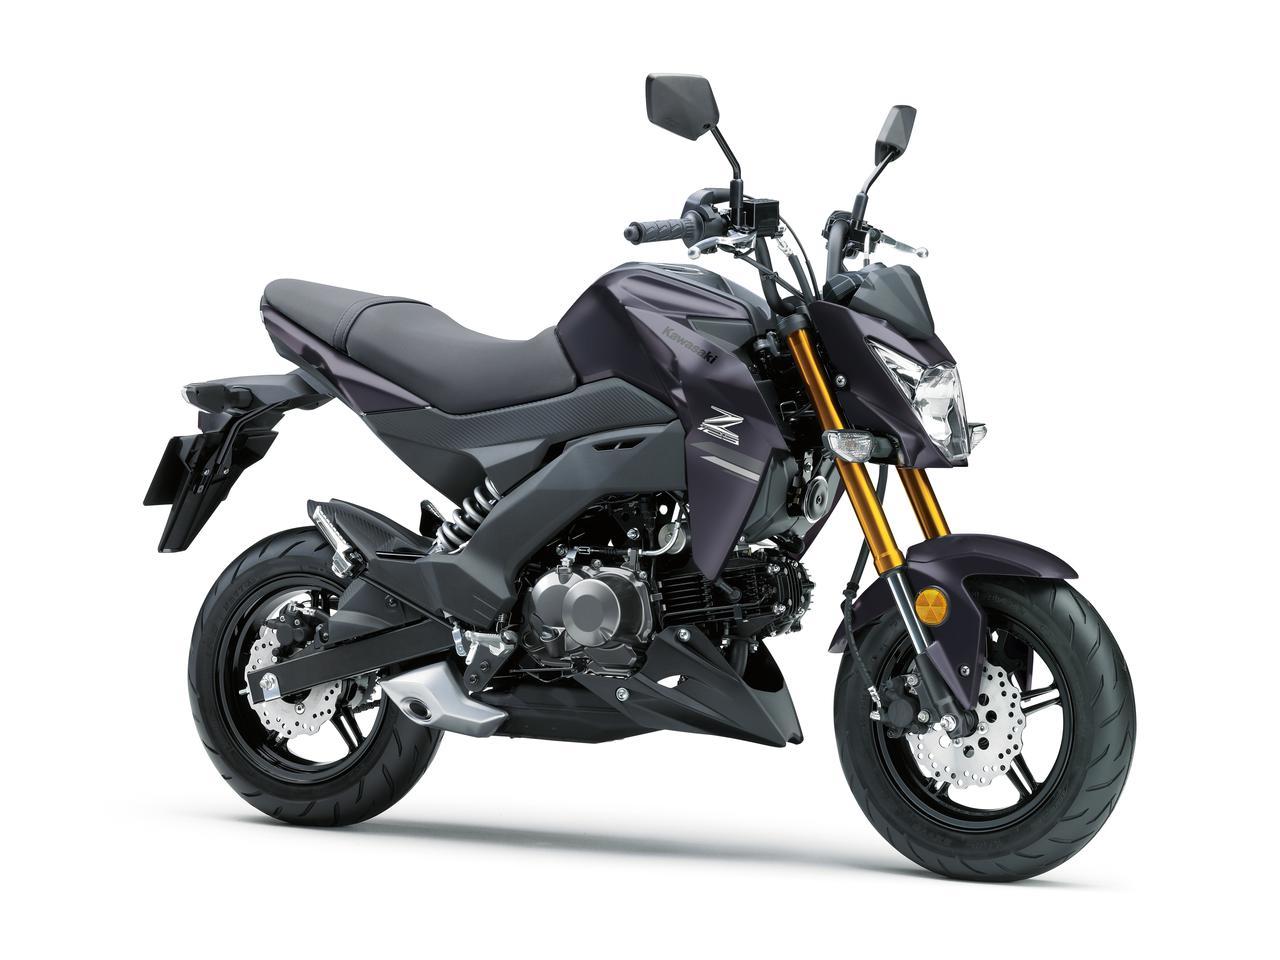 Images : 2番目の画像 - Z125 PROの写真を全て見る - LAWRENCE - Motorcycle x Cars + α = Your Life.